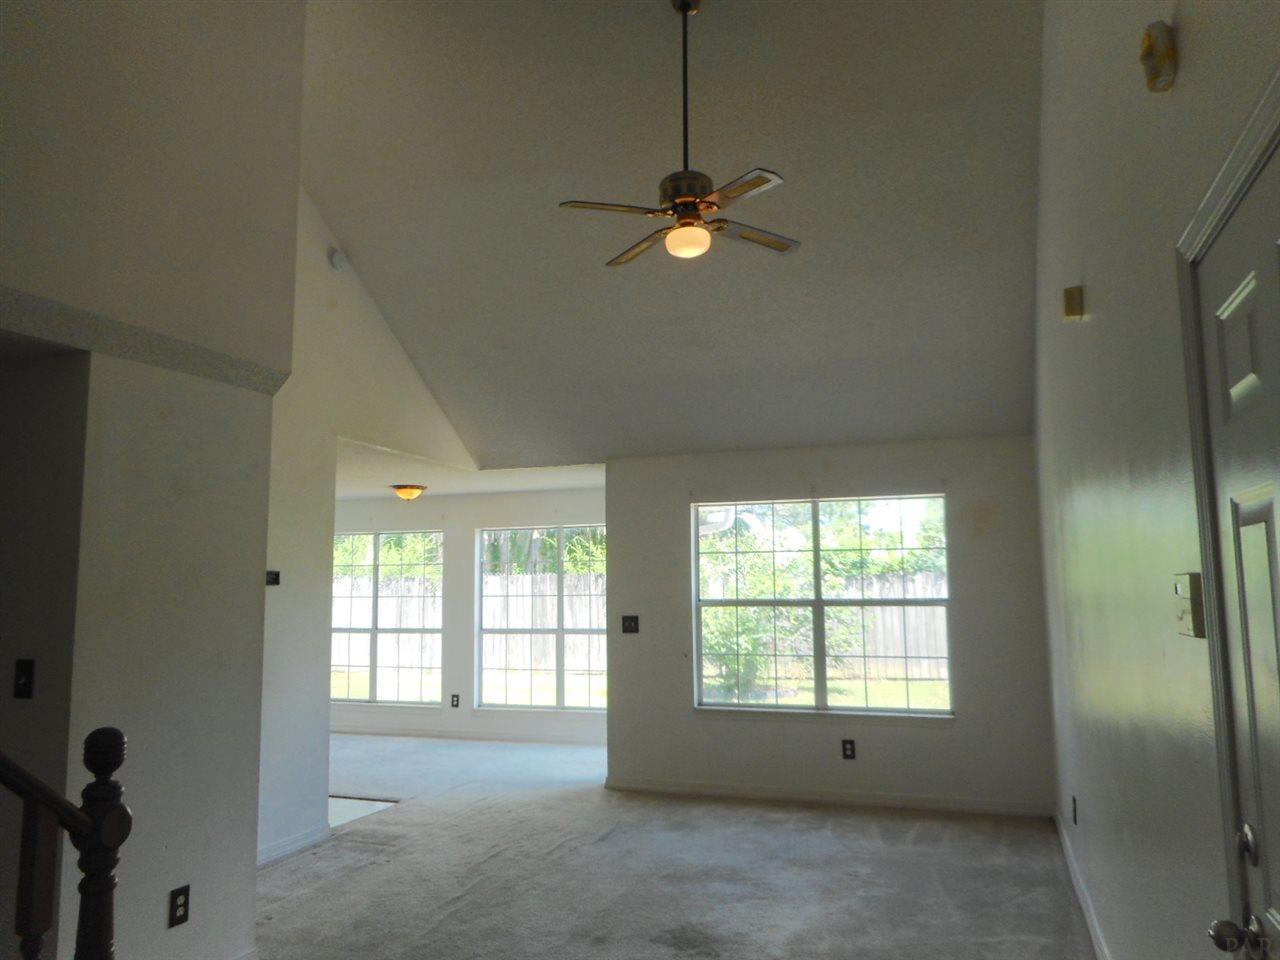 173 Hilburn Ct, Pensacola, FL 32504